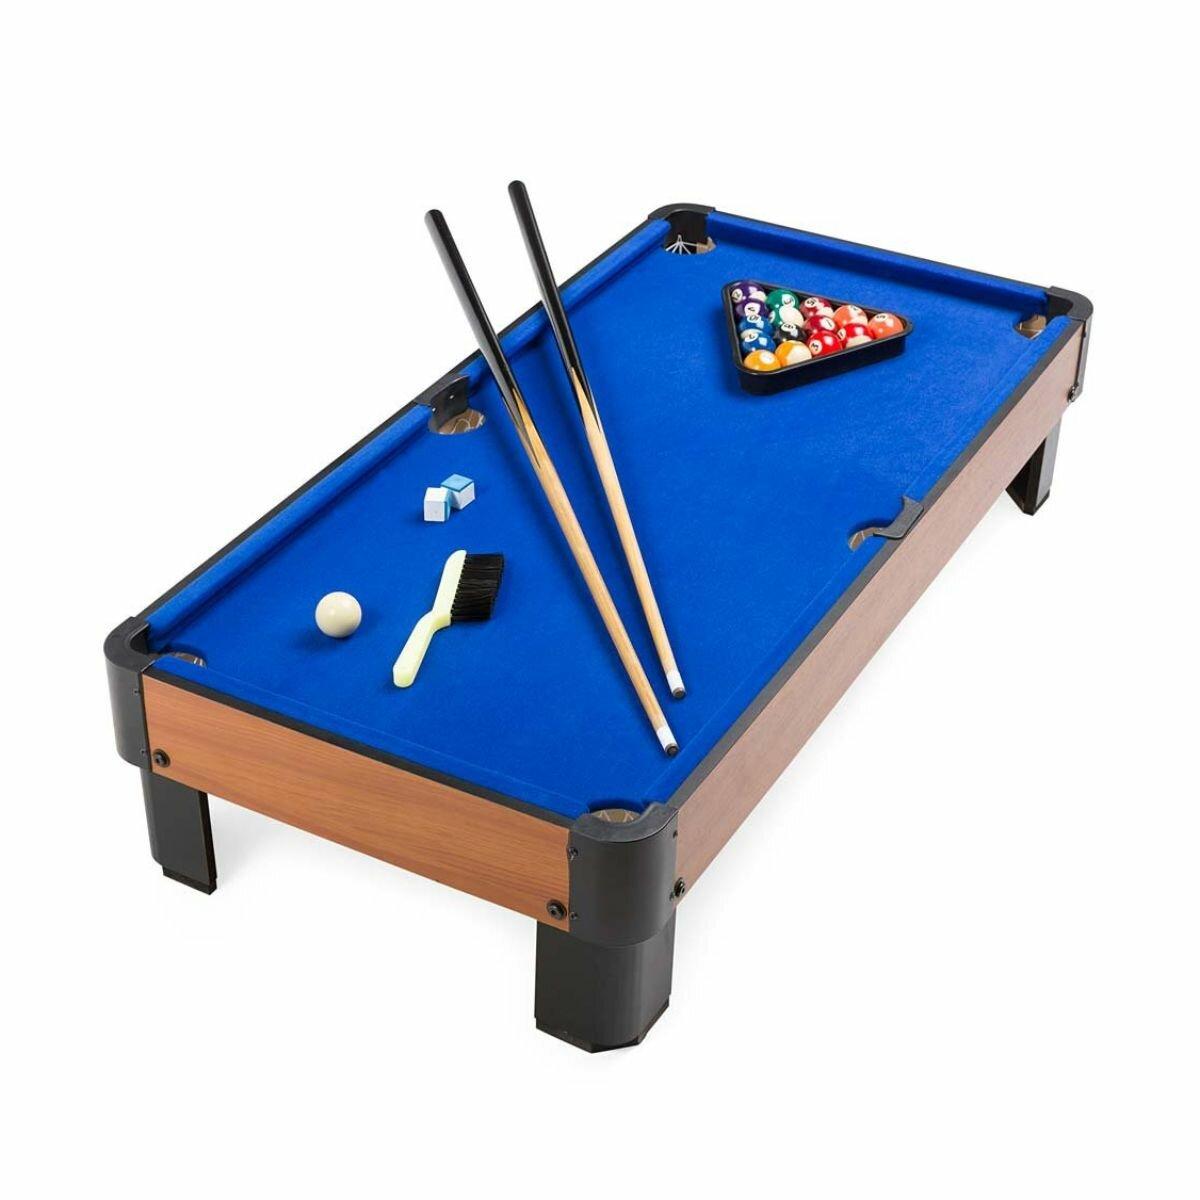 HearthSong Tabletop 3.4' Slate Pool Table & Reviews